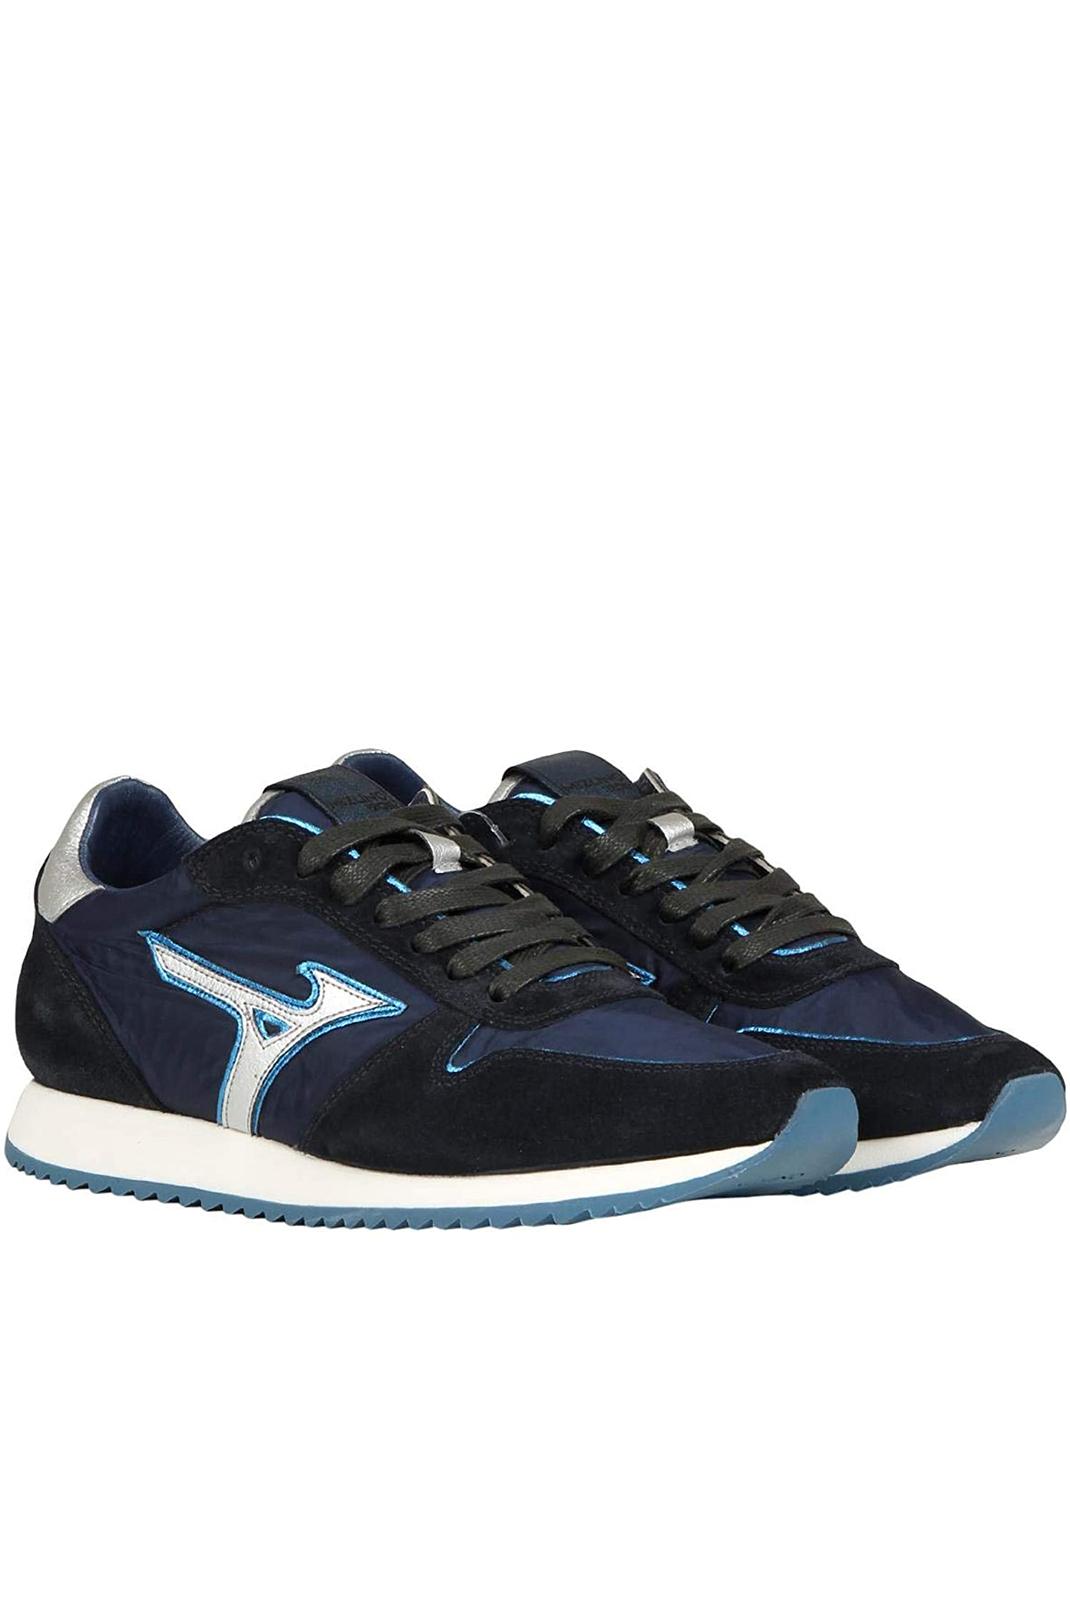 Chaussures   Mizuno D1GE181205 ETAMIN 2 SILVER/BLUE/BLU